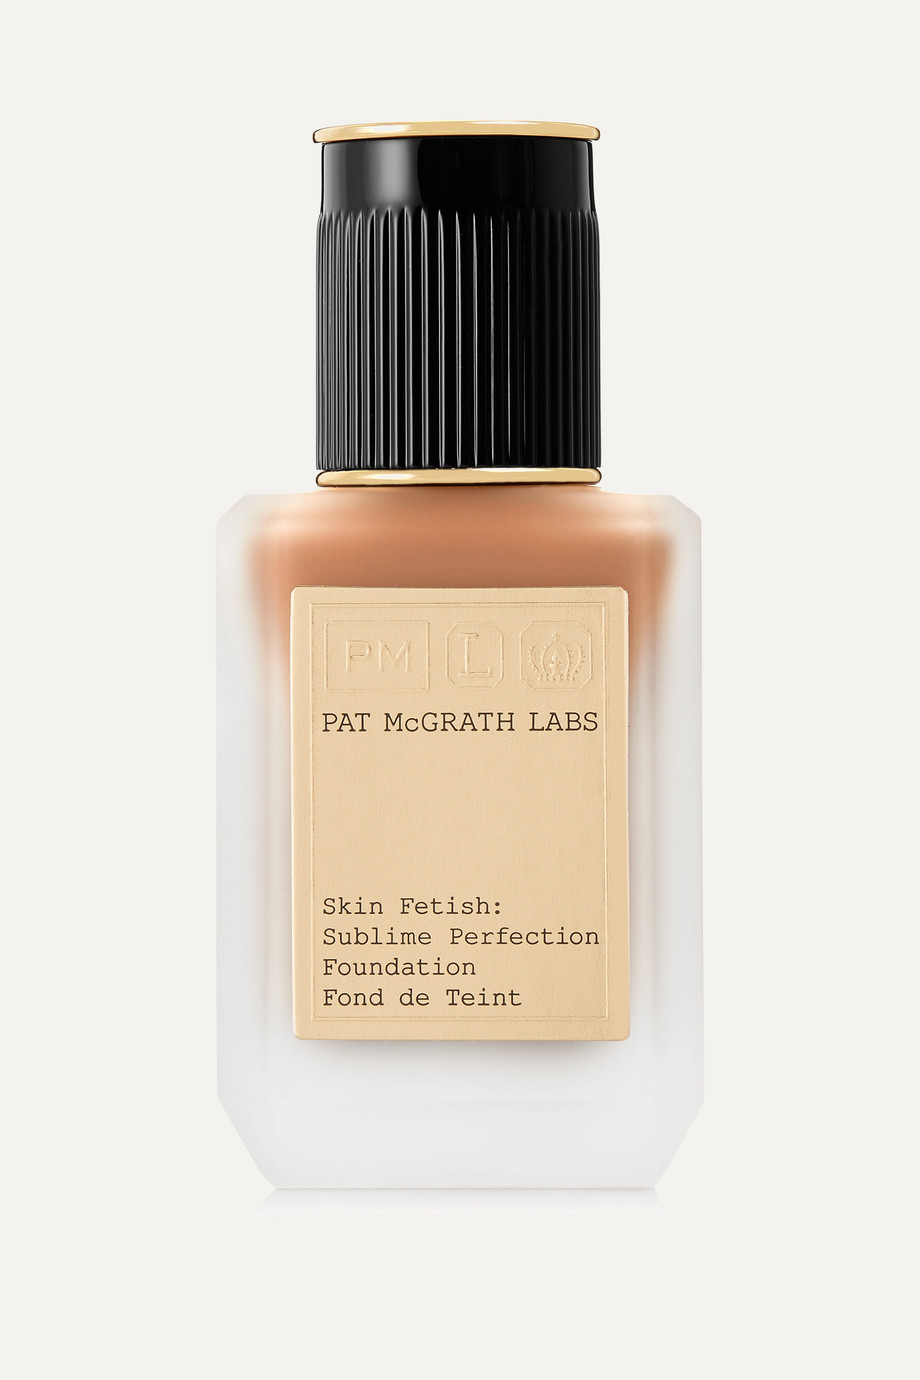 Pat McGrath Labs Skin Fetish: Sublime Perfection Foundation – Medium 20, 35 ml – Foundation